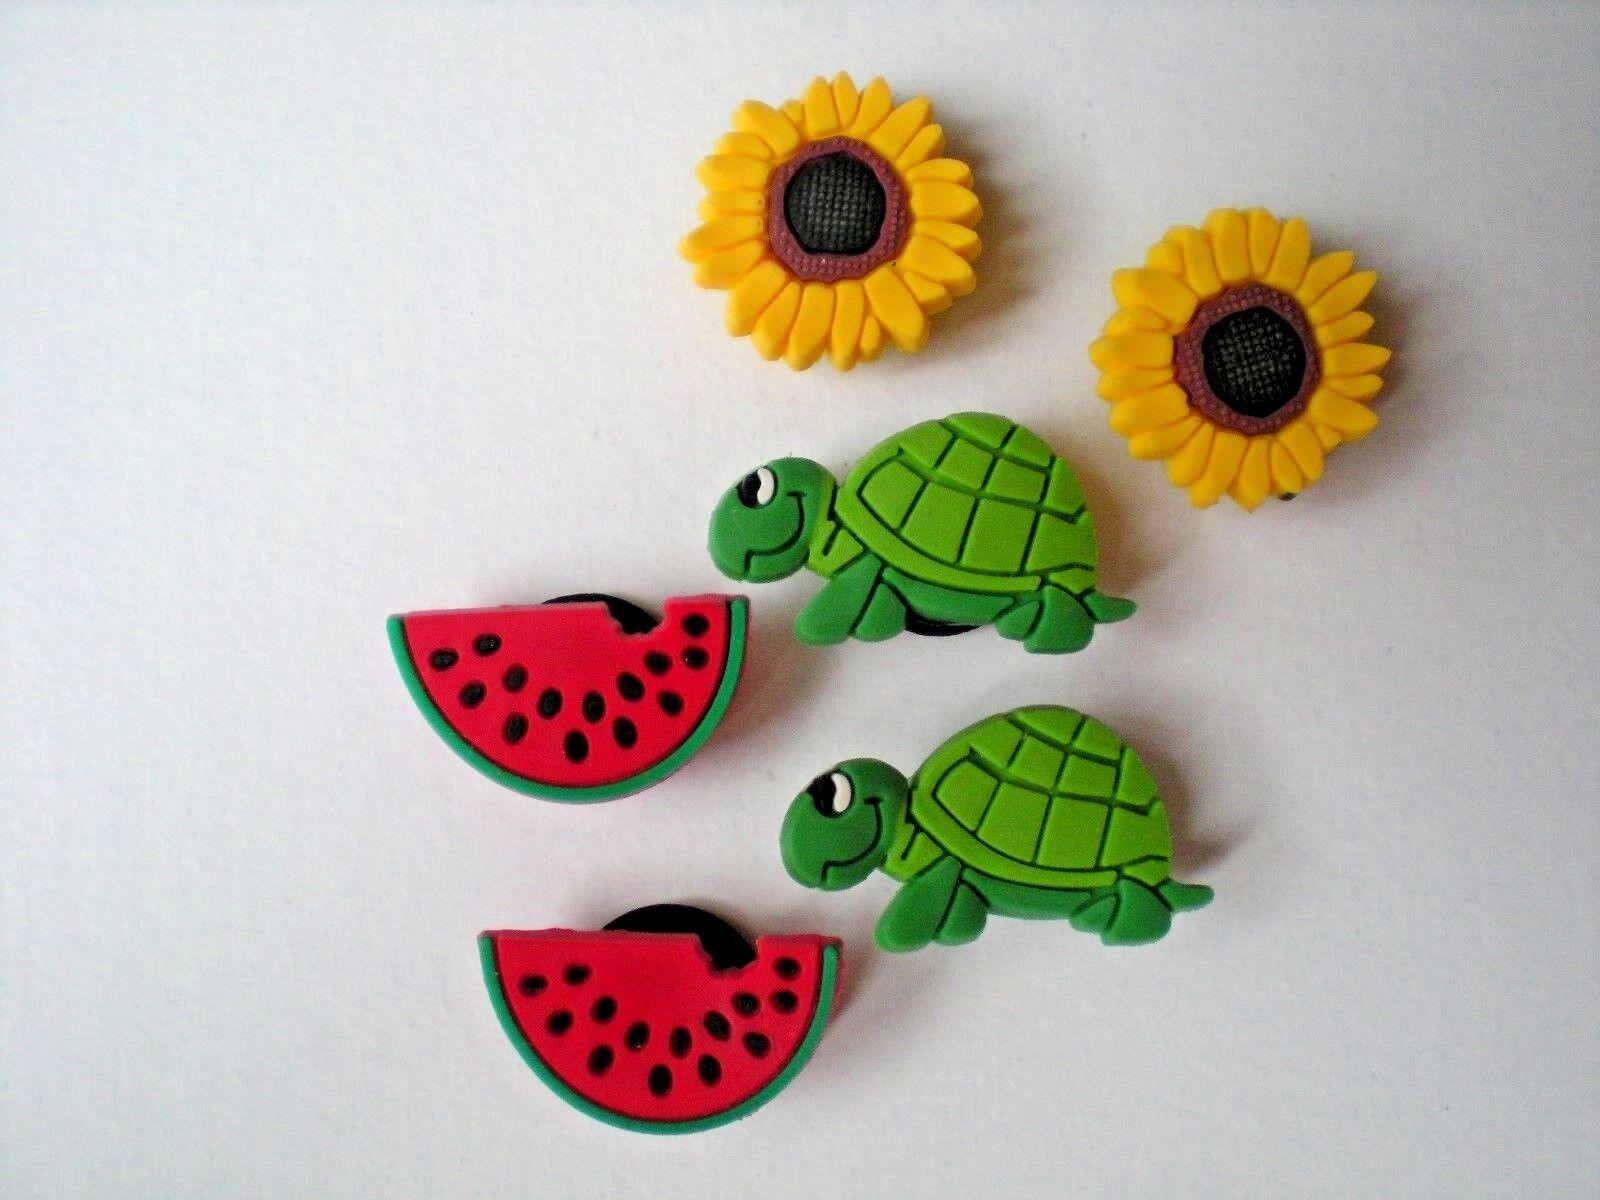 Flowers /& Fruit Shoe Charms Shoe Pin clog Accessories Shoe Decorations